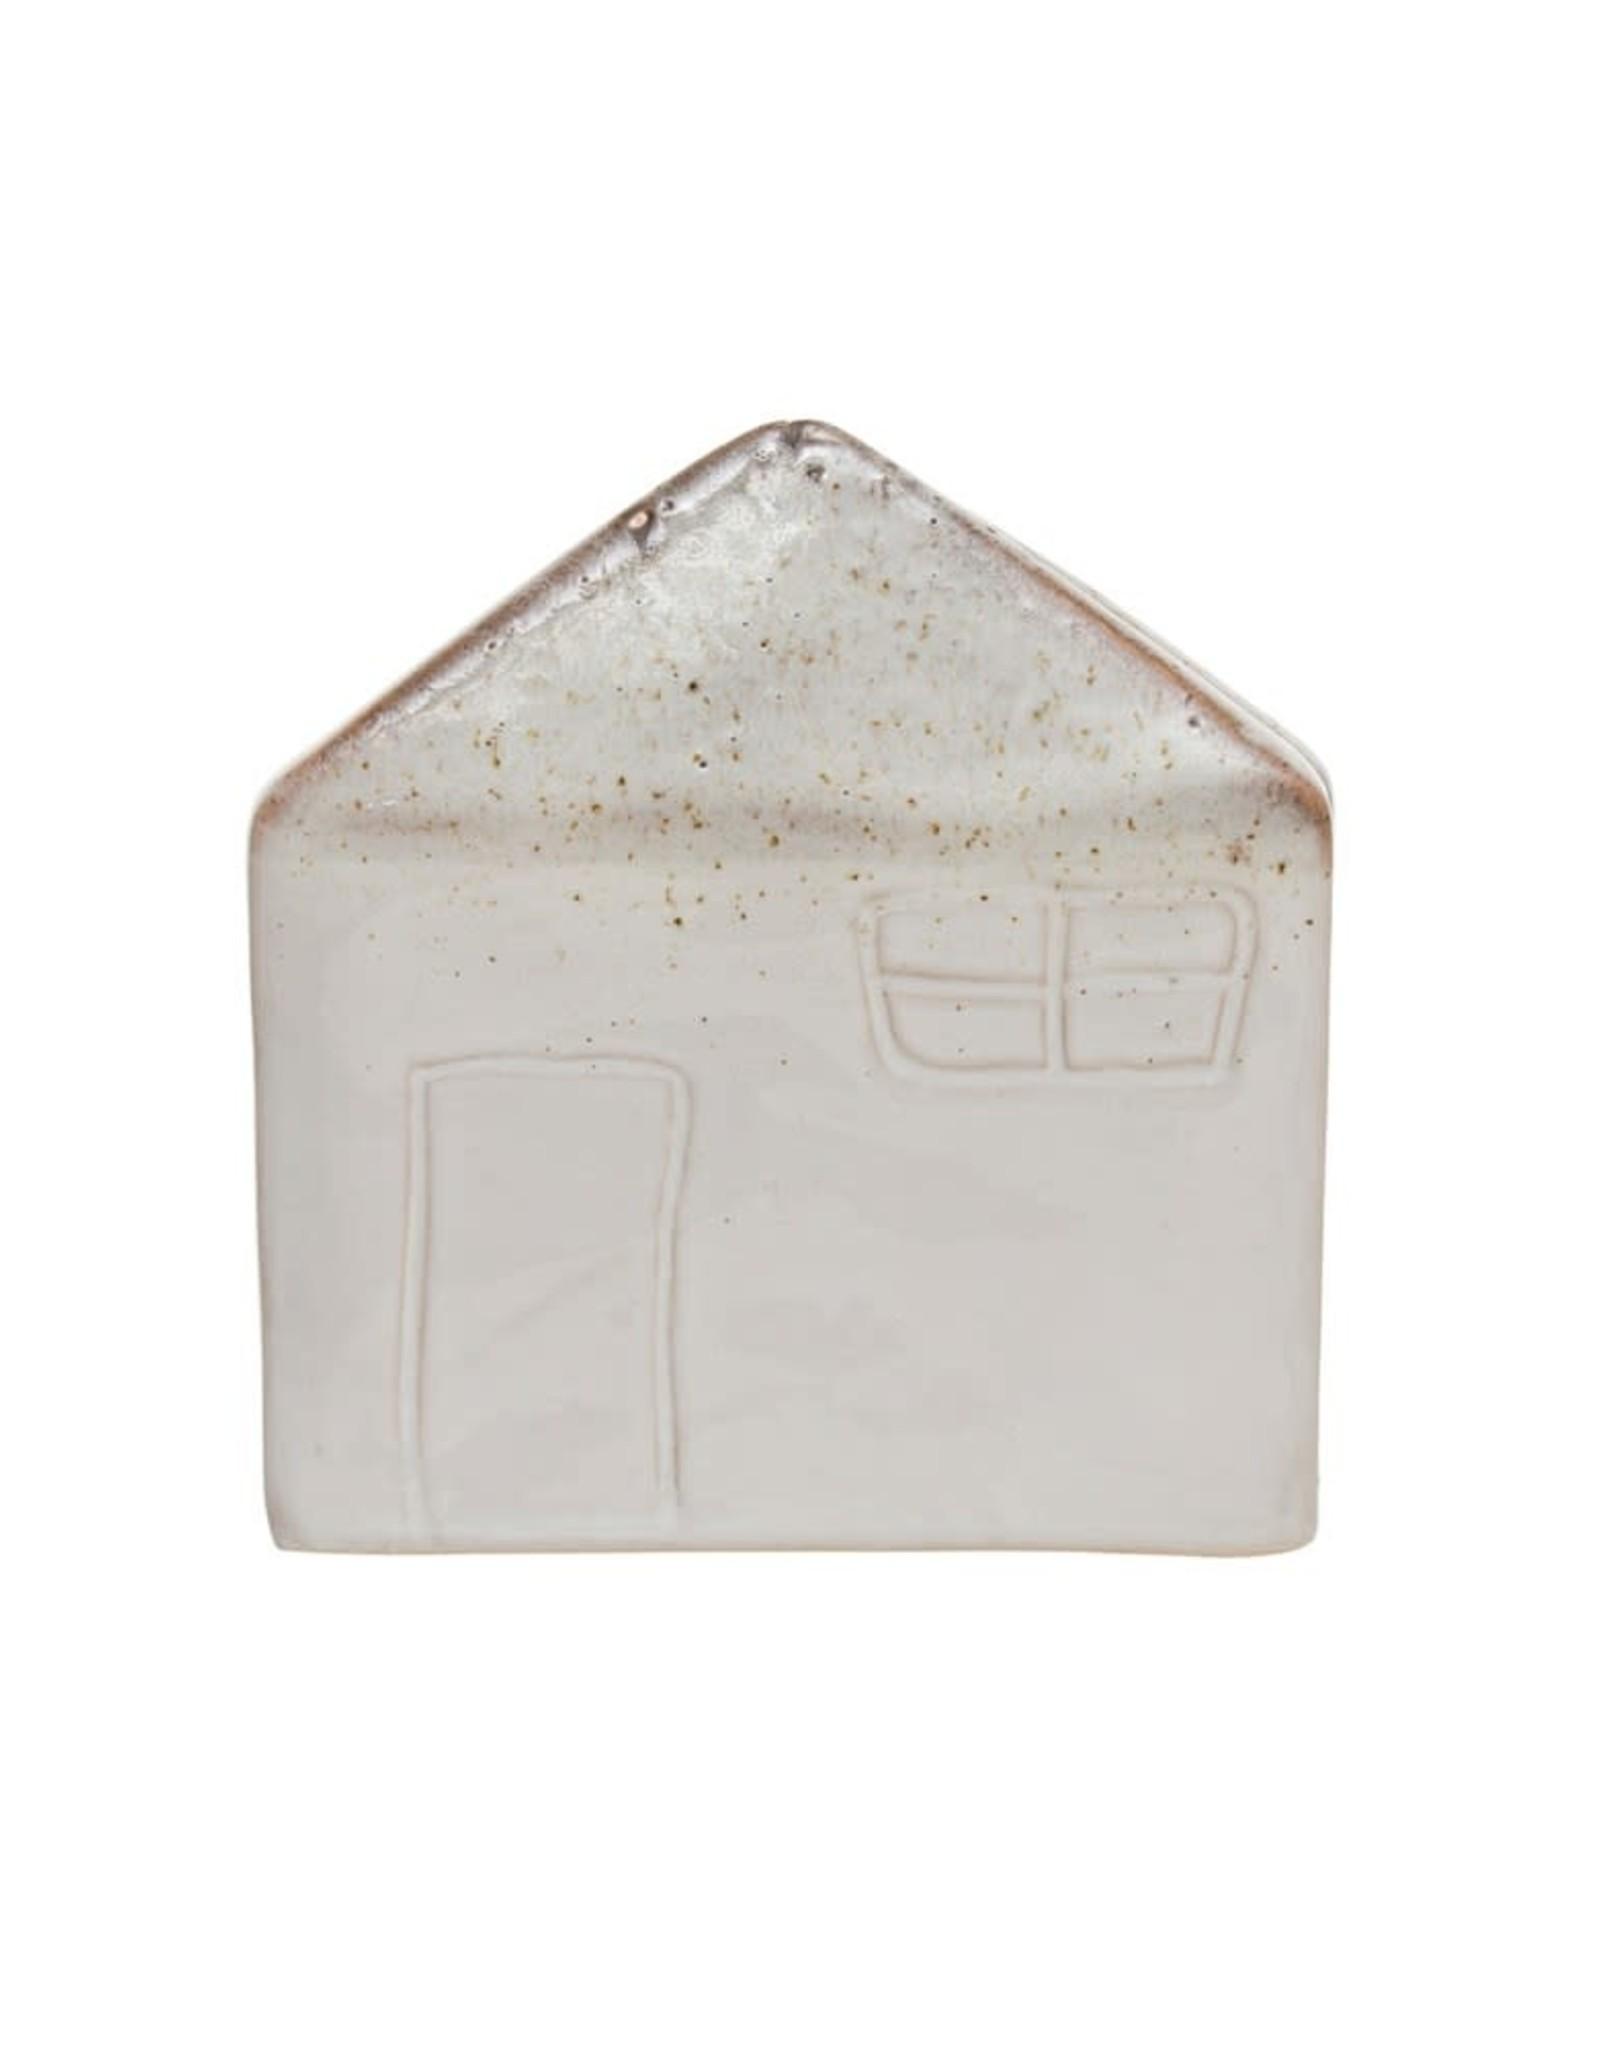 Wink Stoneware House Sponge Holder